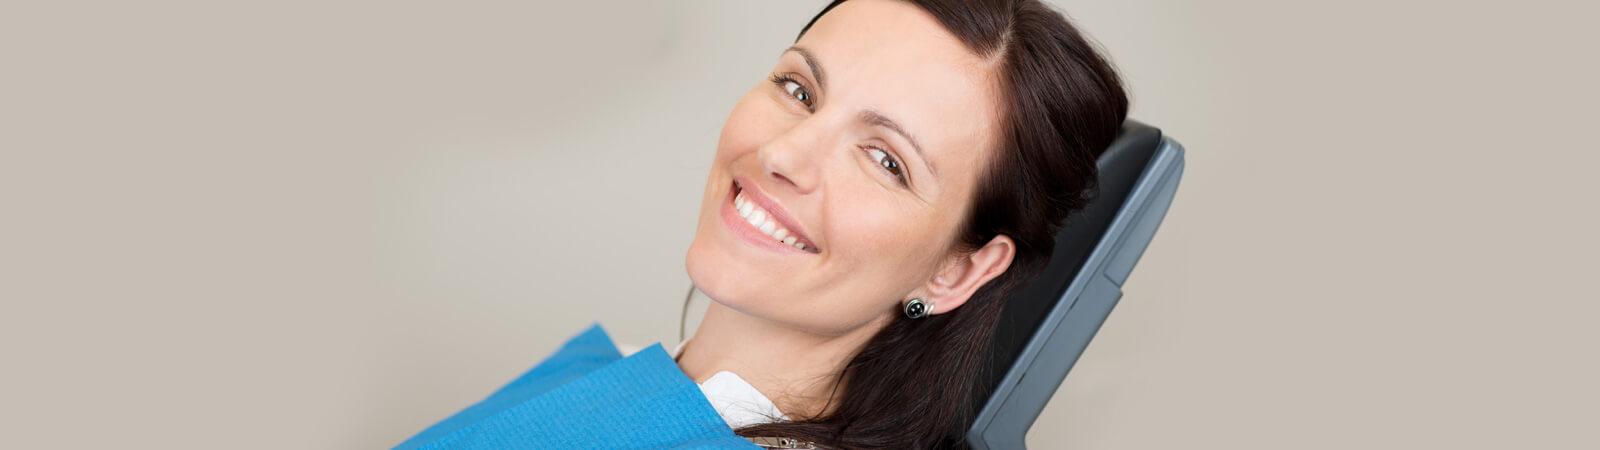 Gum Disease Treatments - Vivid Dental, Houston TX